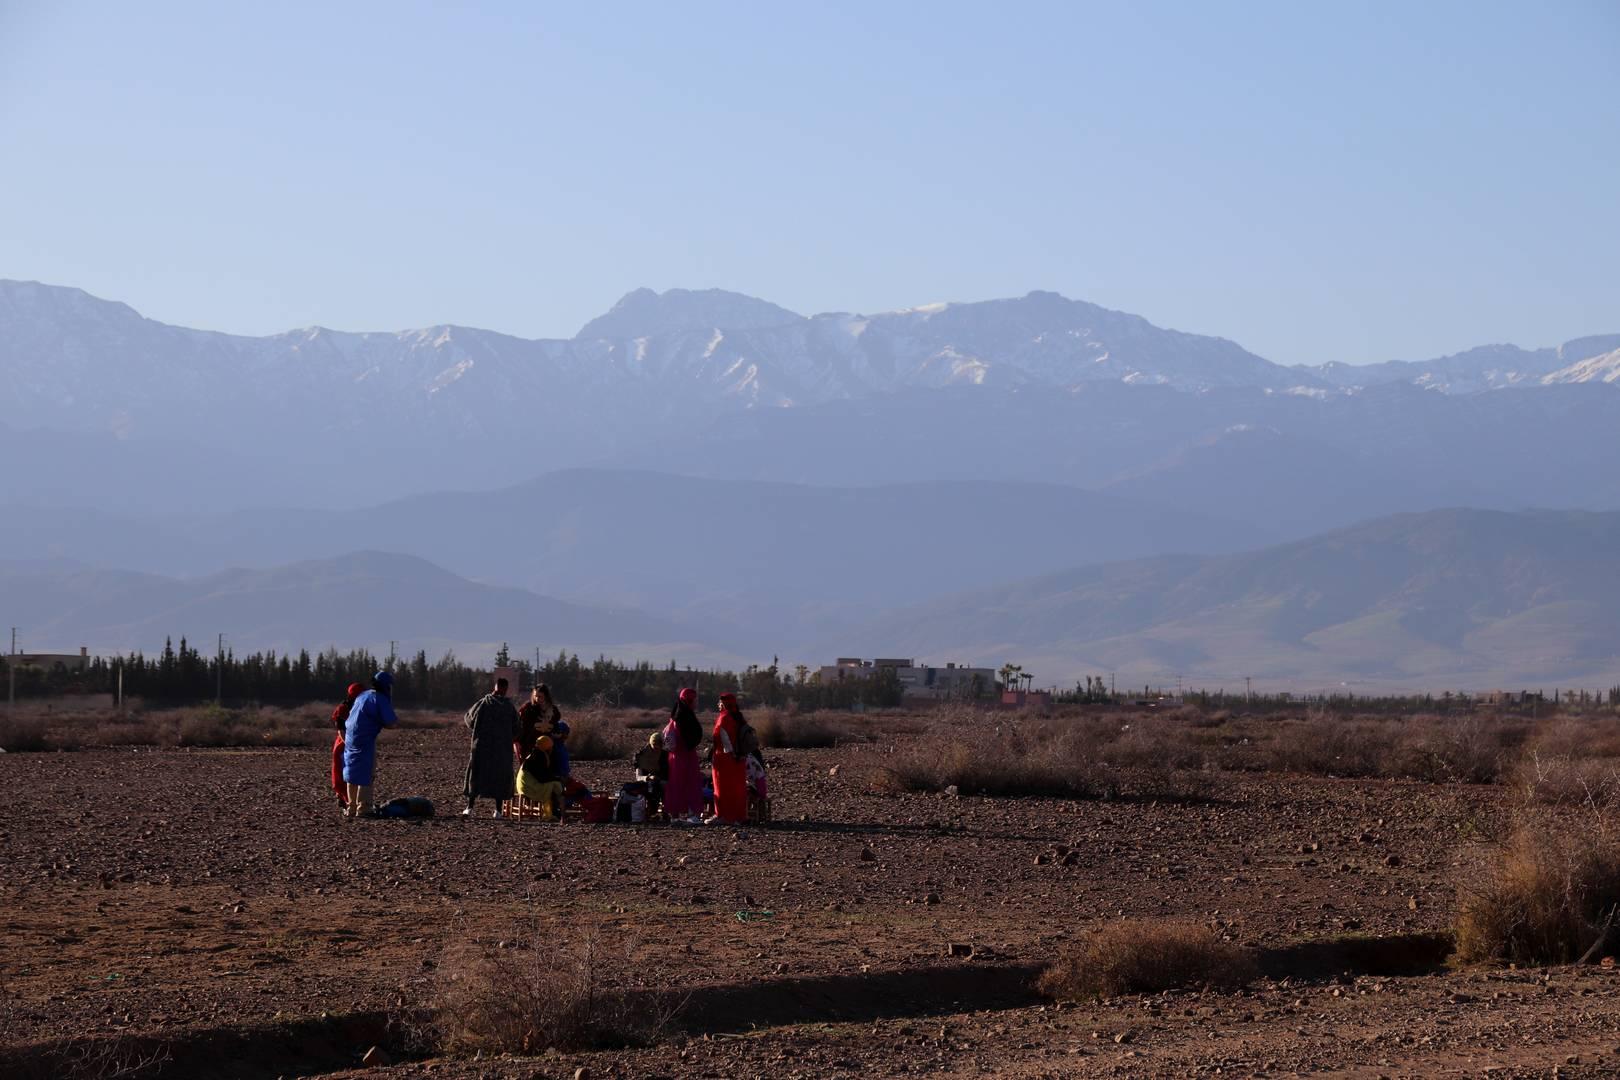 Maroc - Bergers dans la vallée d'Imlil